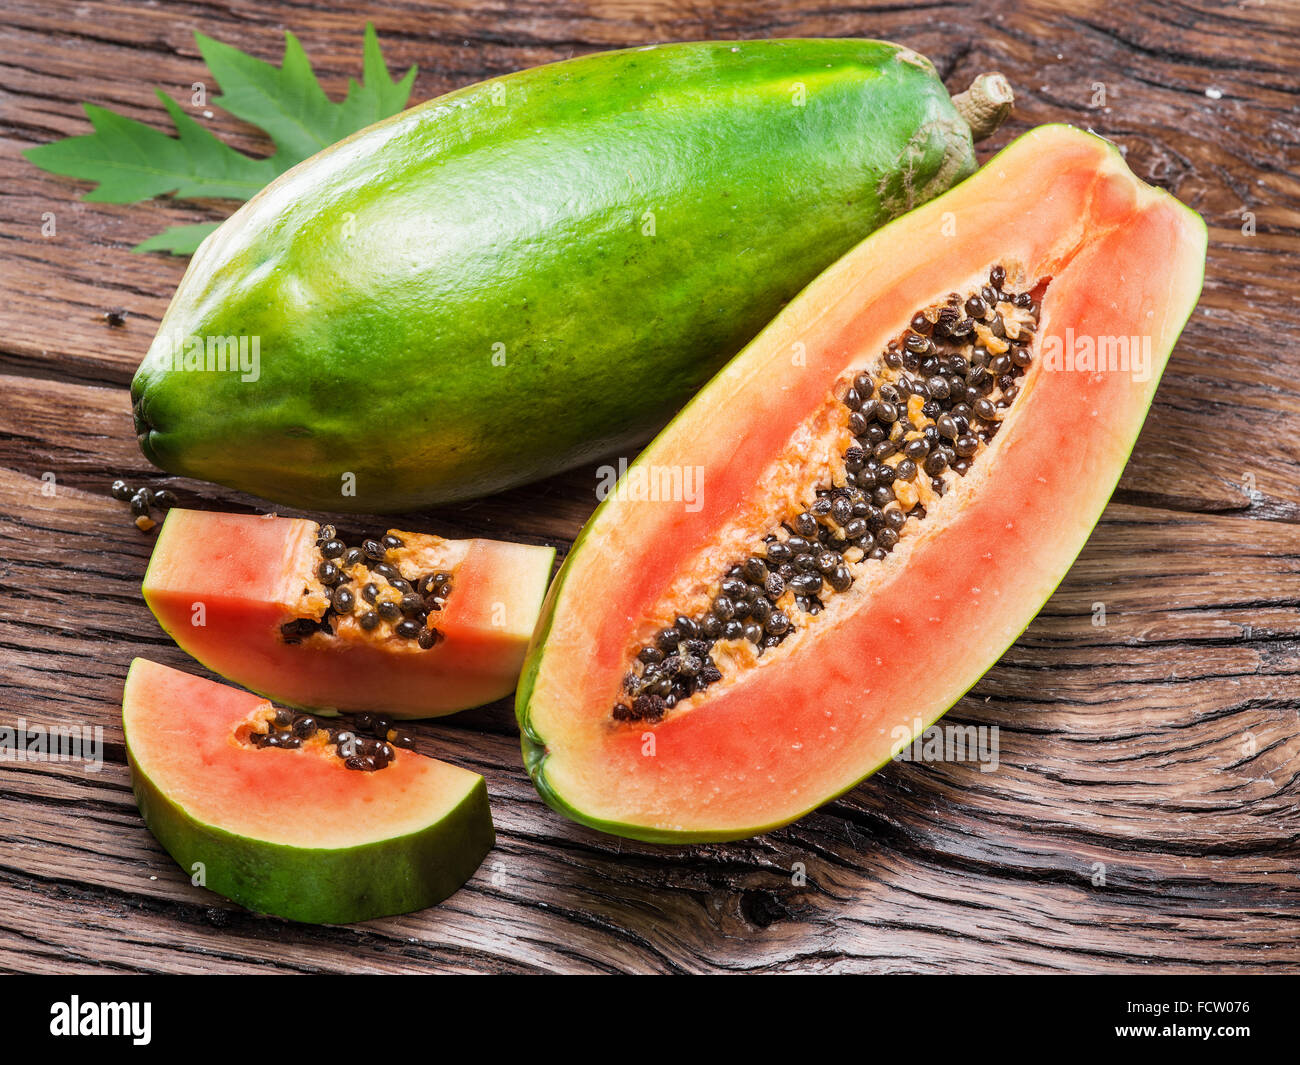 Papaya fruta sobre fondo de madera. Imagen De Stock